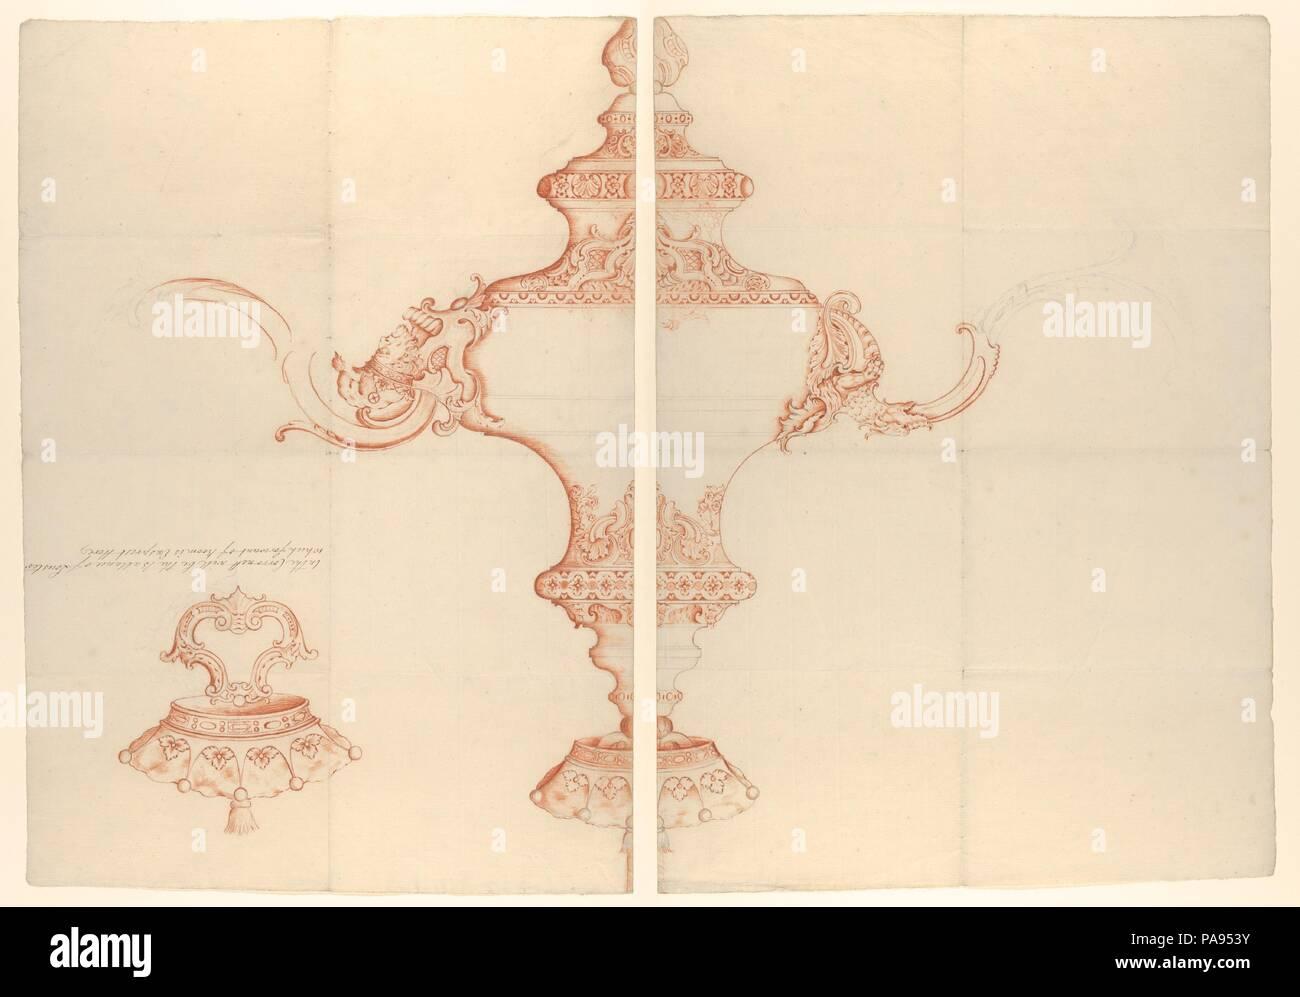 1742 1745 Imágenes De Stock & 1742 1745 Fotos De Stock - Alamy